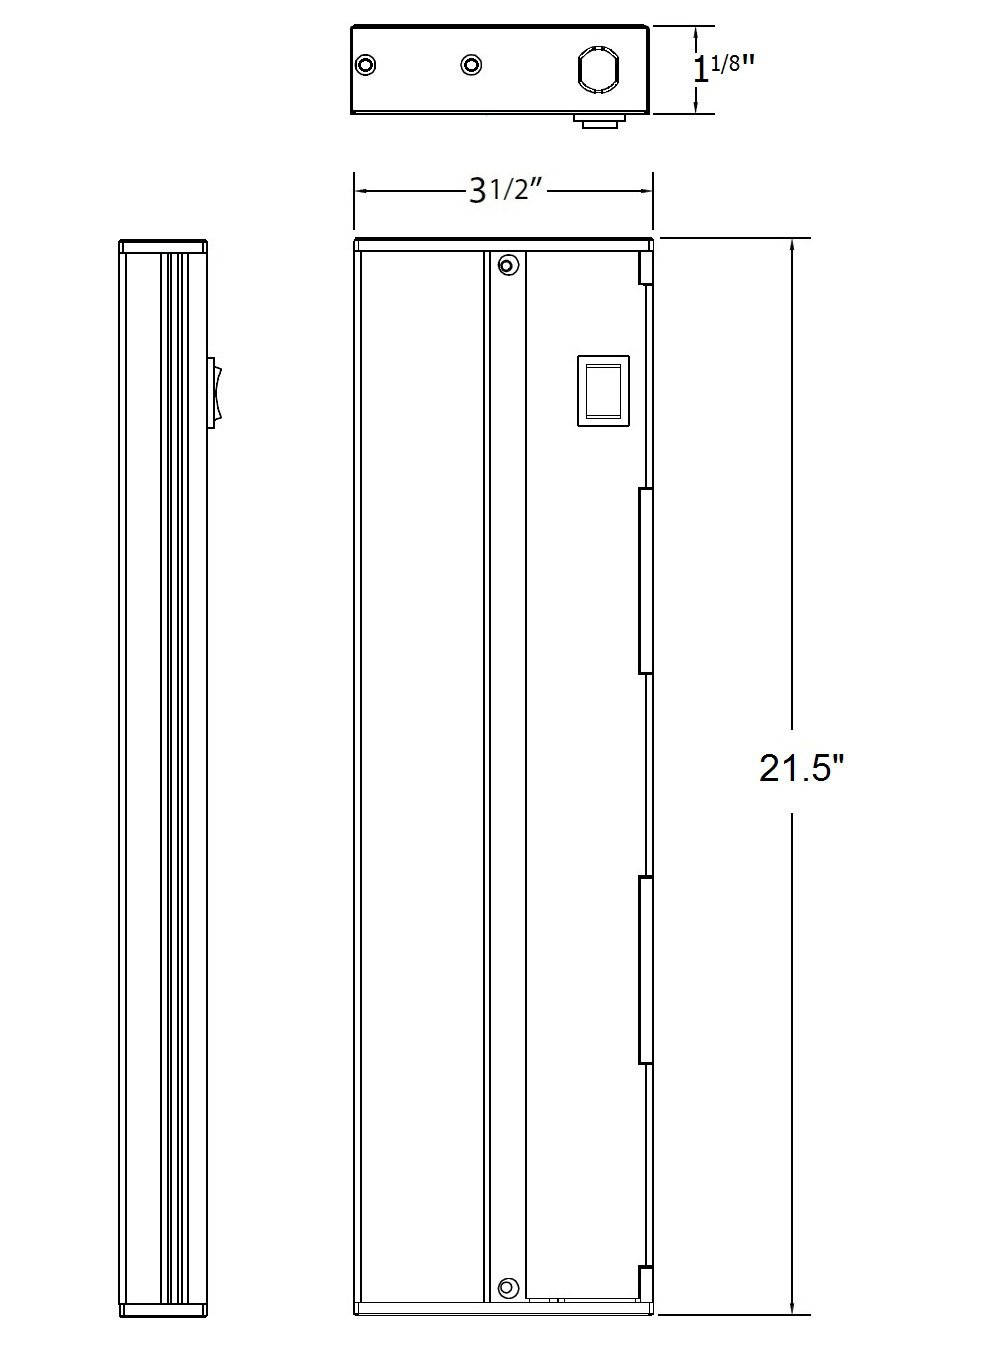 NICOR Lighting 21-Inch Under Cabinet LED Lighting, White (NUC-2-21-WH)